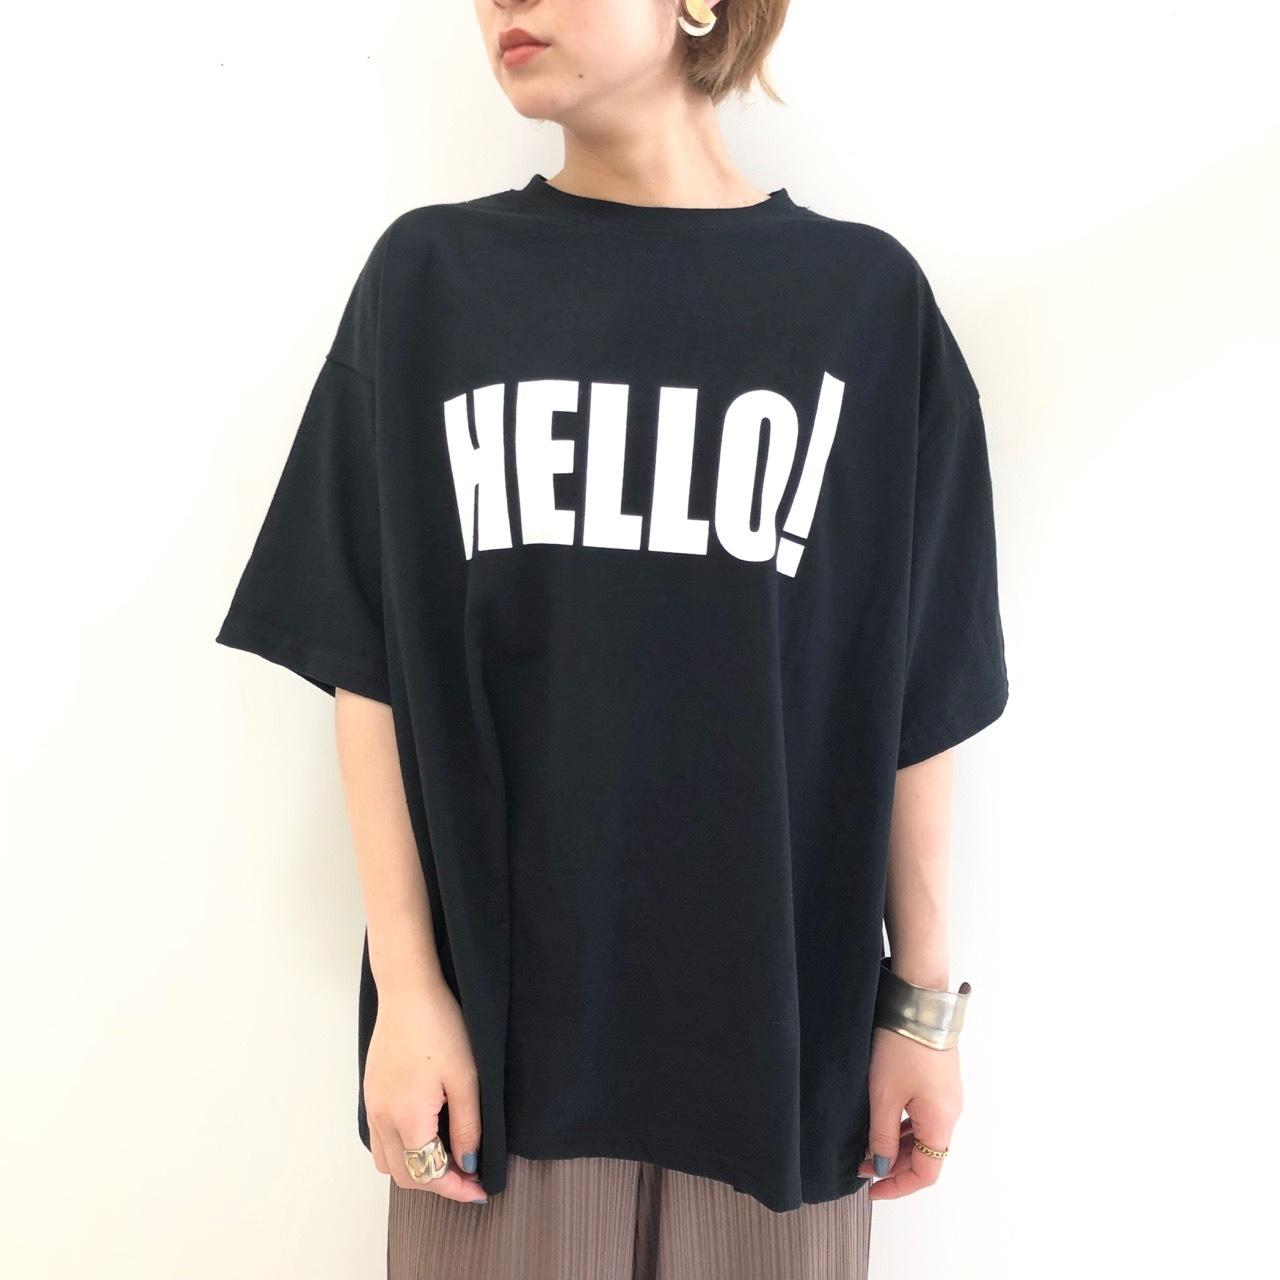 【 Days 】- 119-1470 - HELLO Teeシャツ